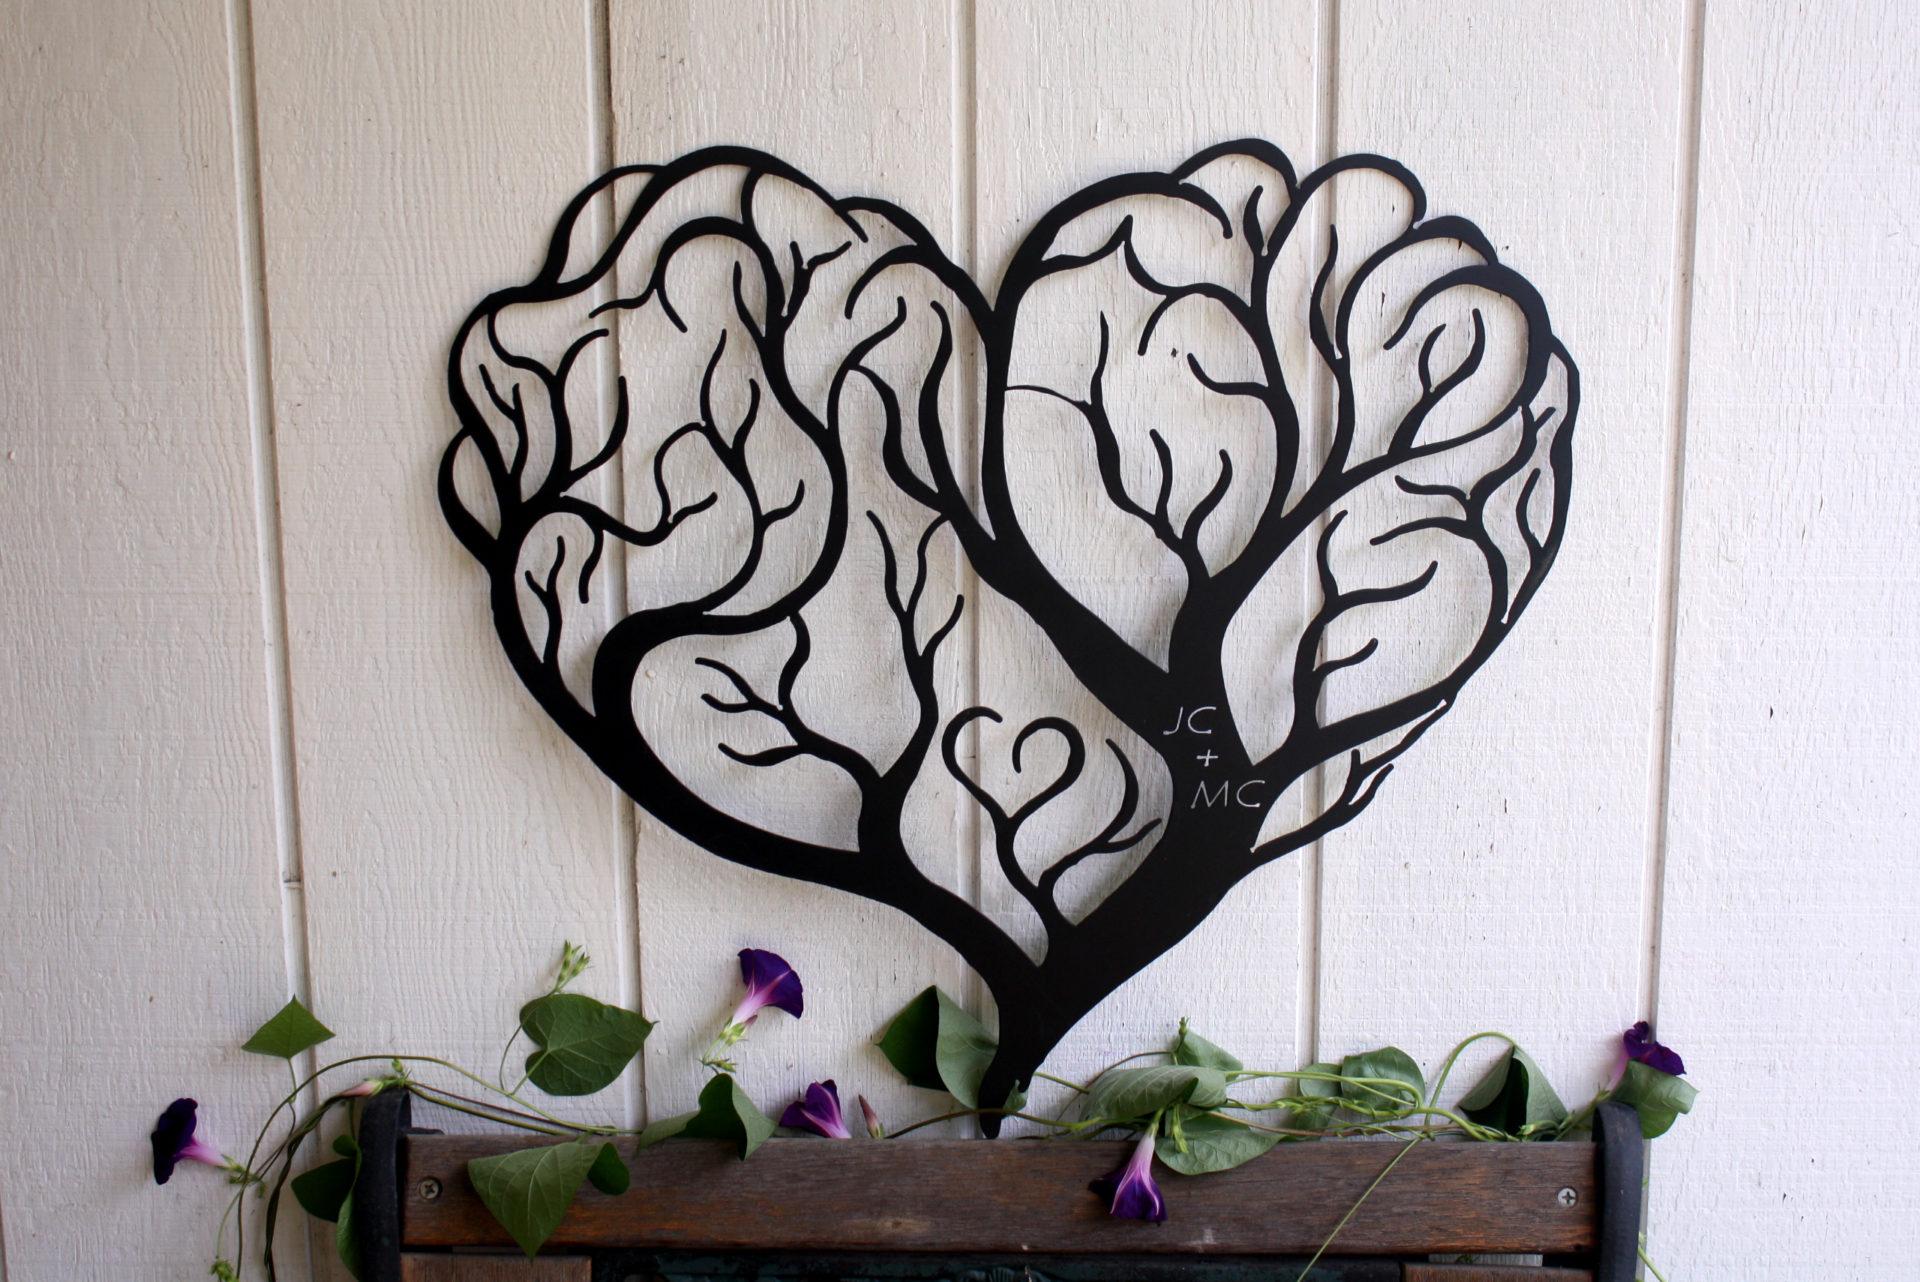 Metal Tree Wall Art Gallery: Custom Heart Tree Metal Wall Art Sign